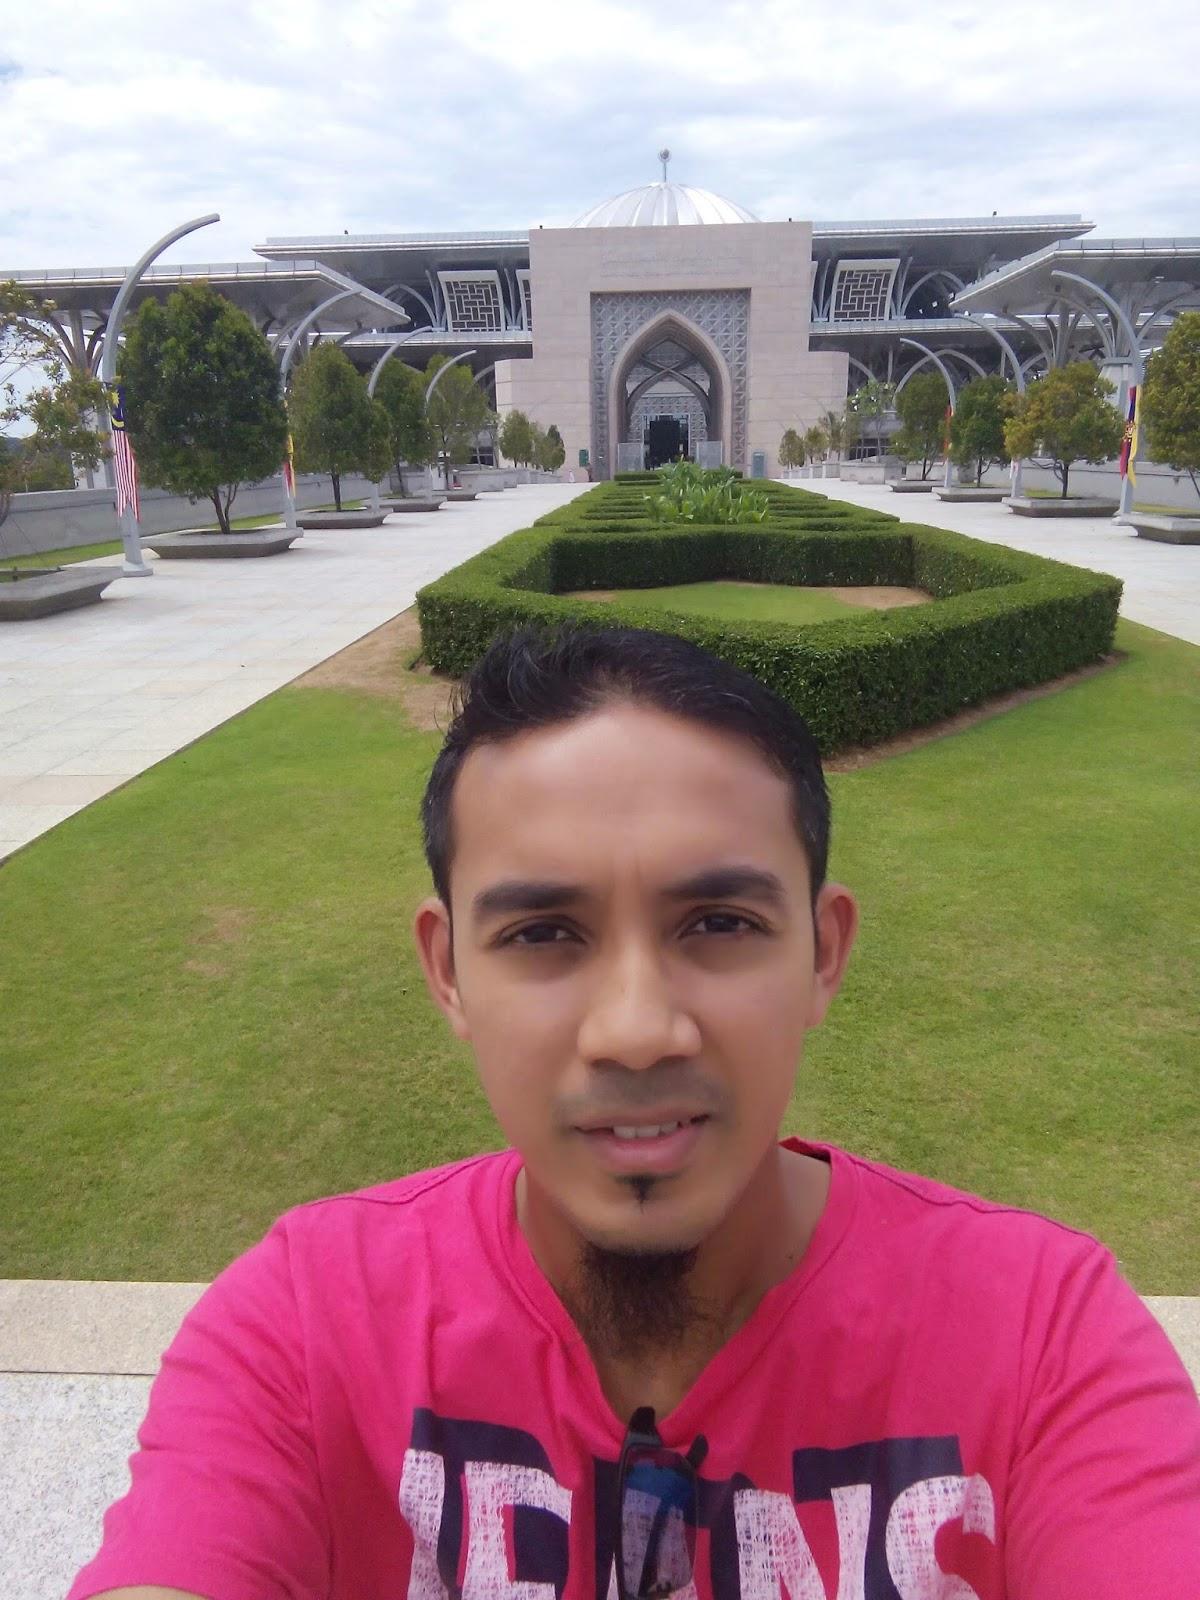 Selfie, Masjid Besi, Masjid Tuanku Zainal Abidin, Putrajaya, visit malaysia 2015